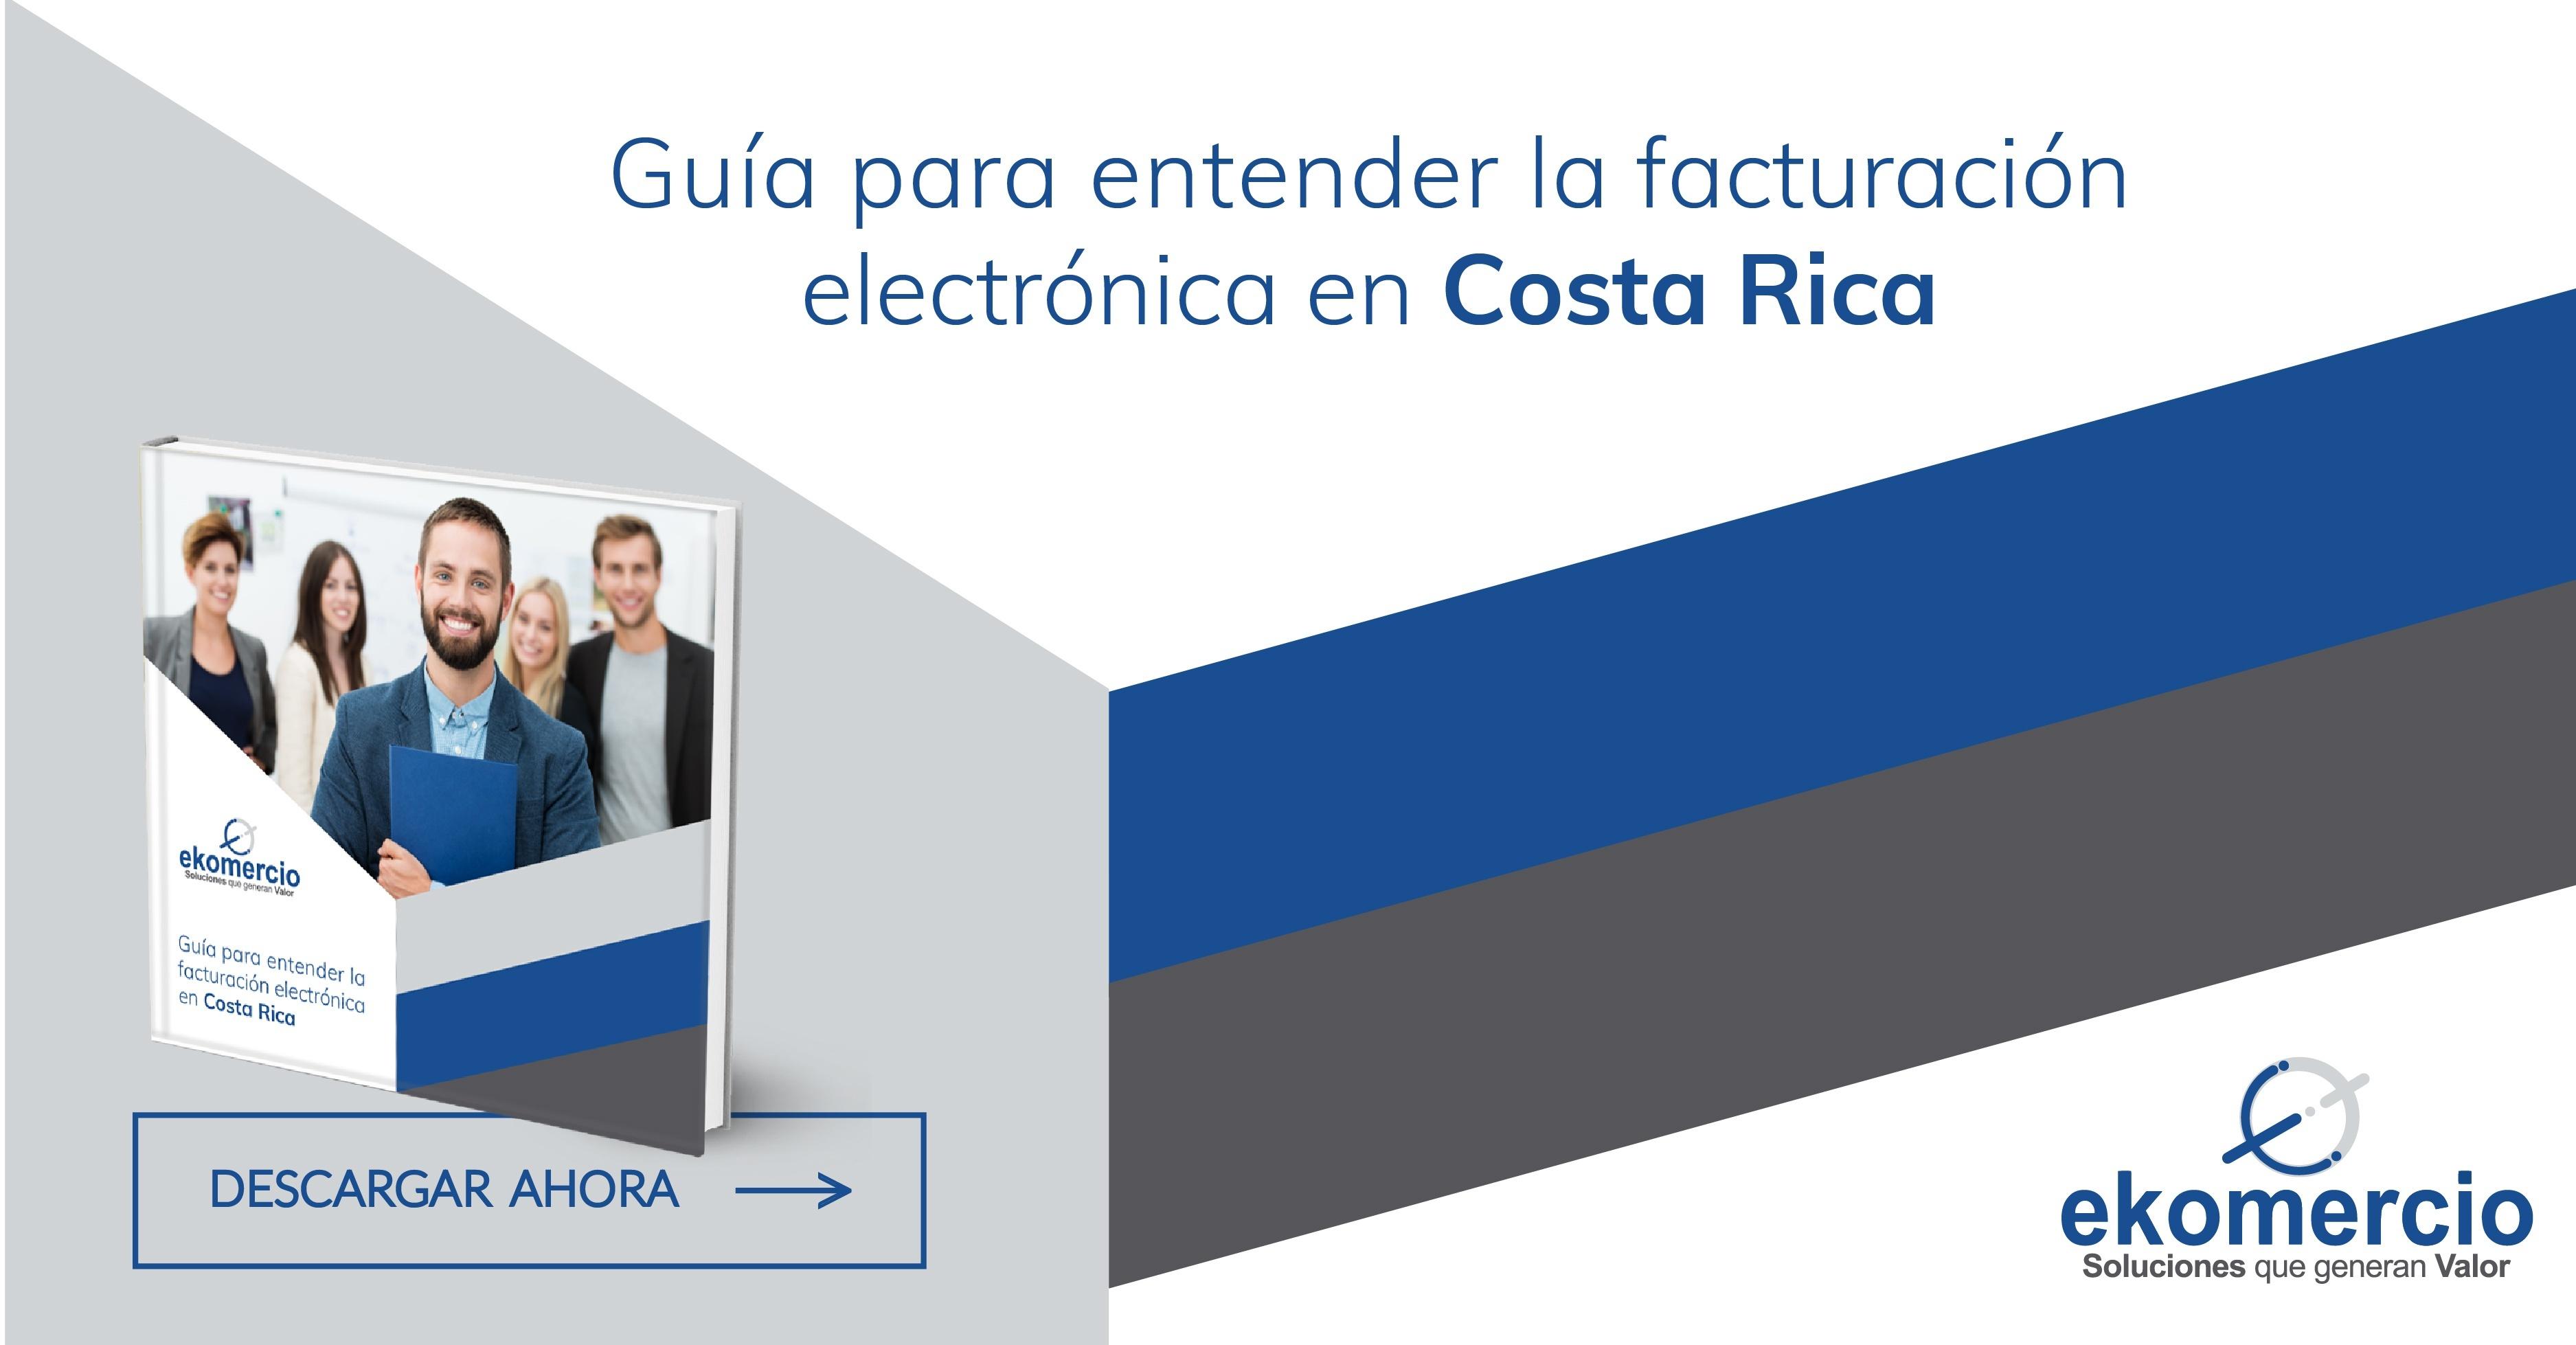 Guía para entender la facturación electrónica en Costa Rica